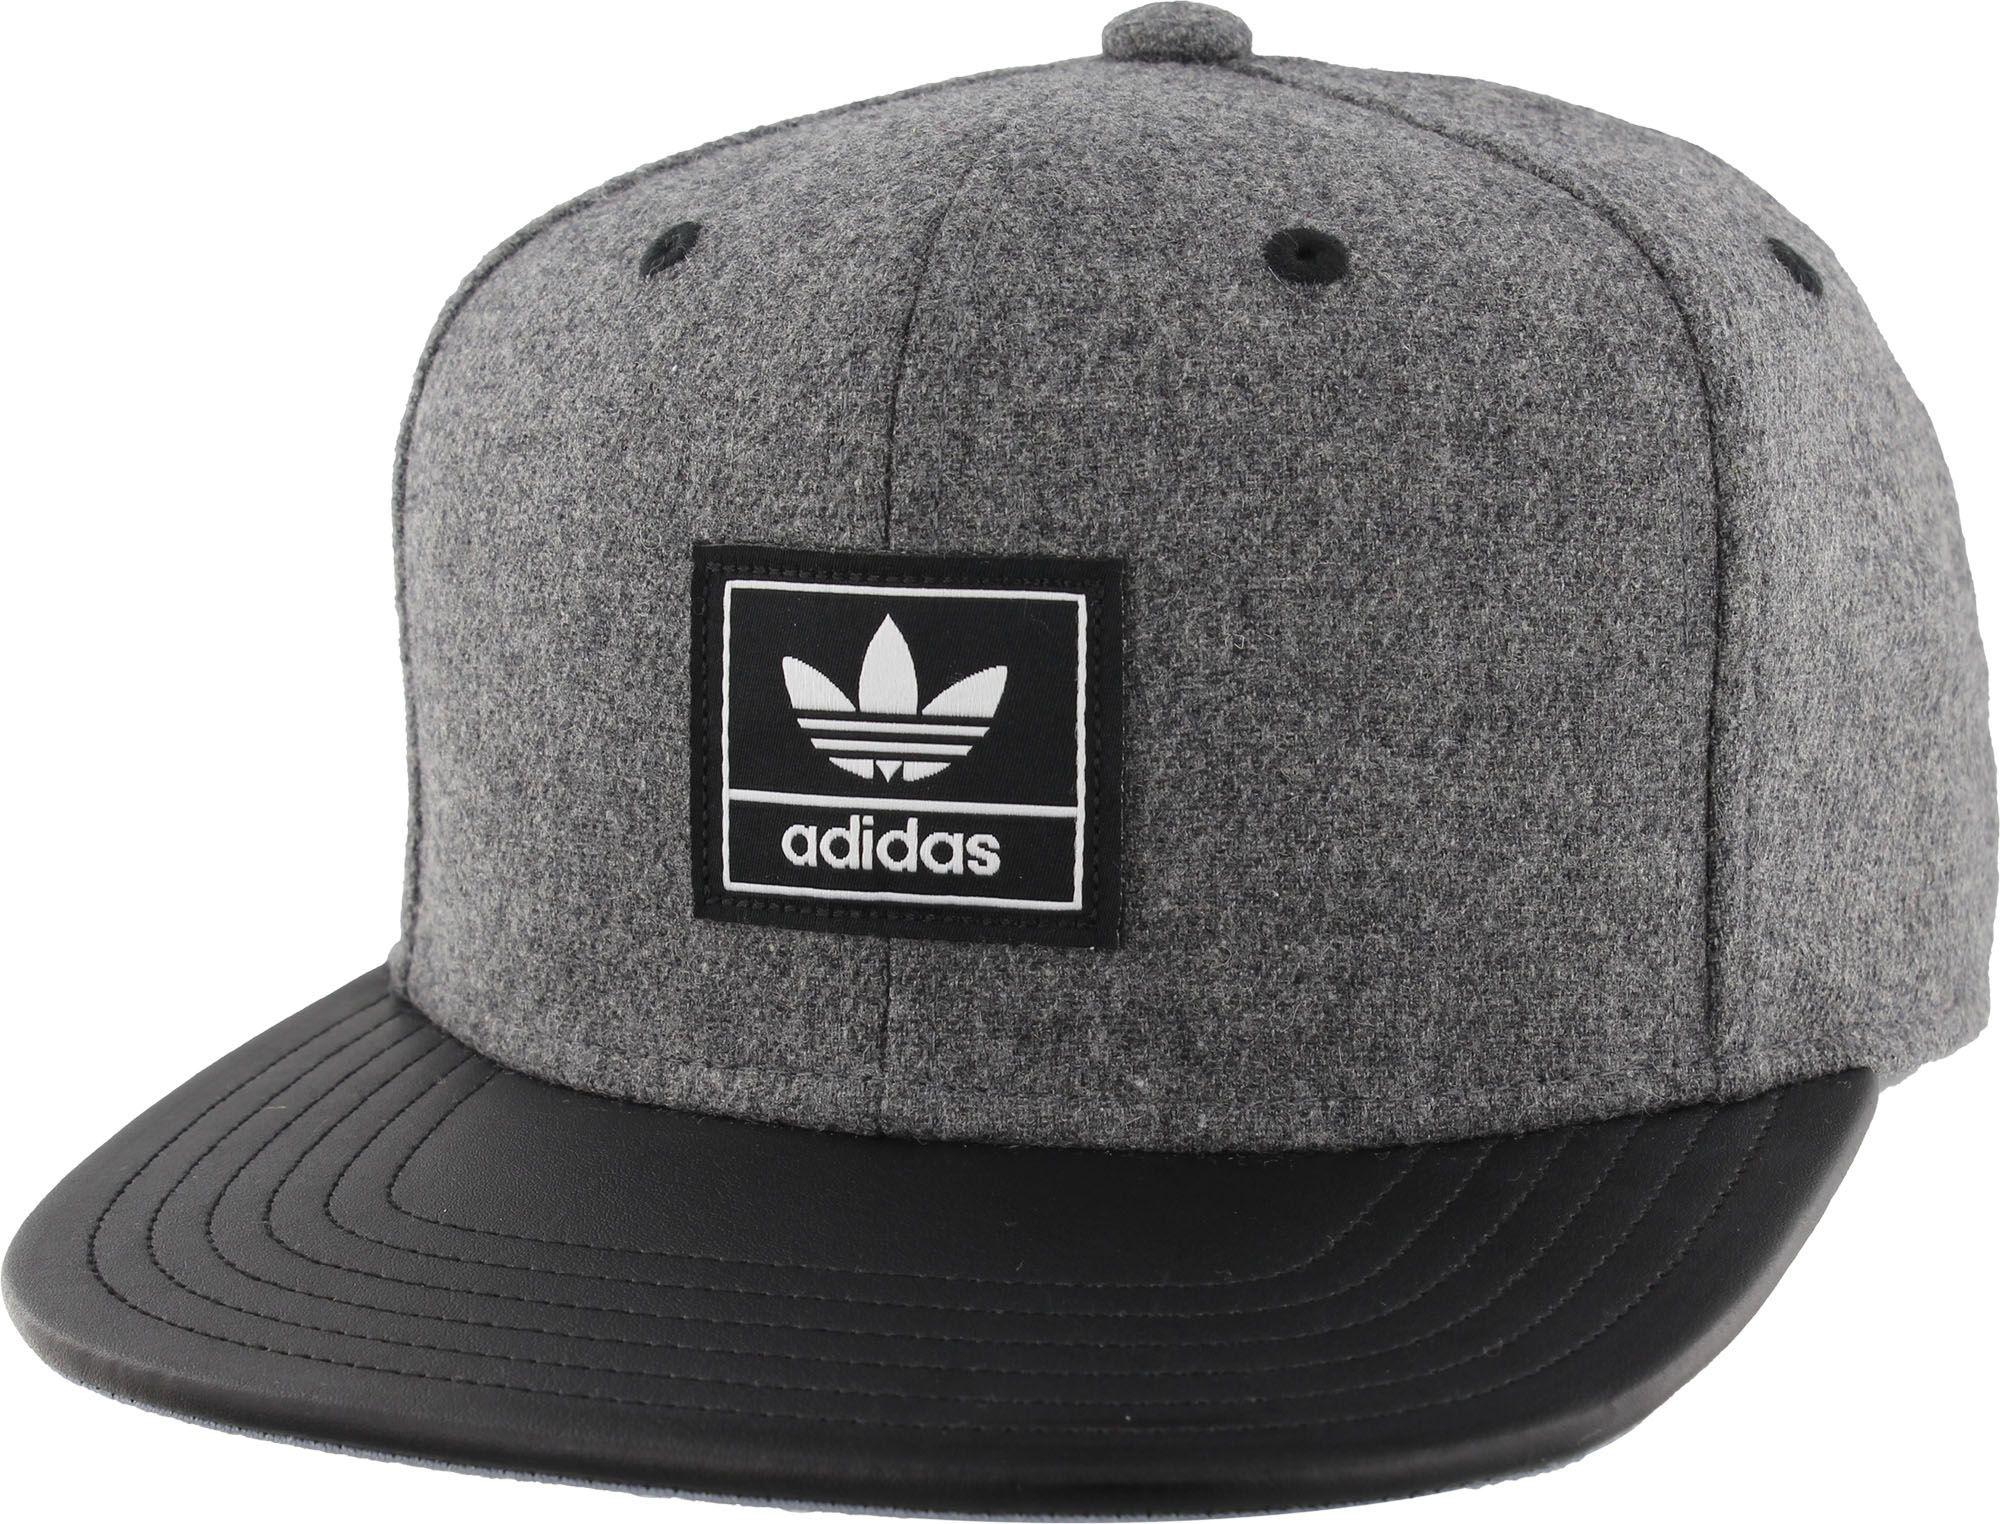 a07219fc907 adidas Originals Men s Trefoil Plus Snapback Hat